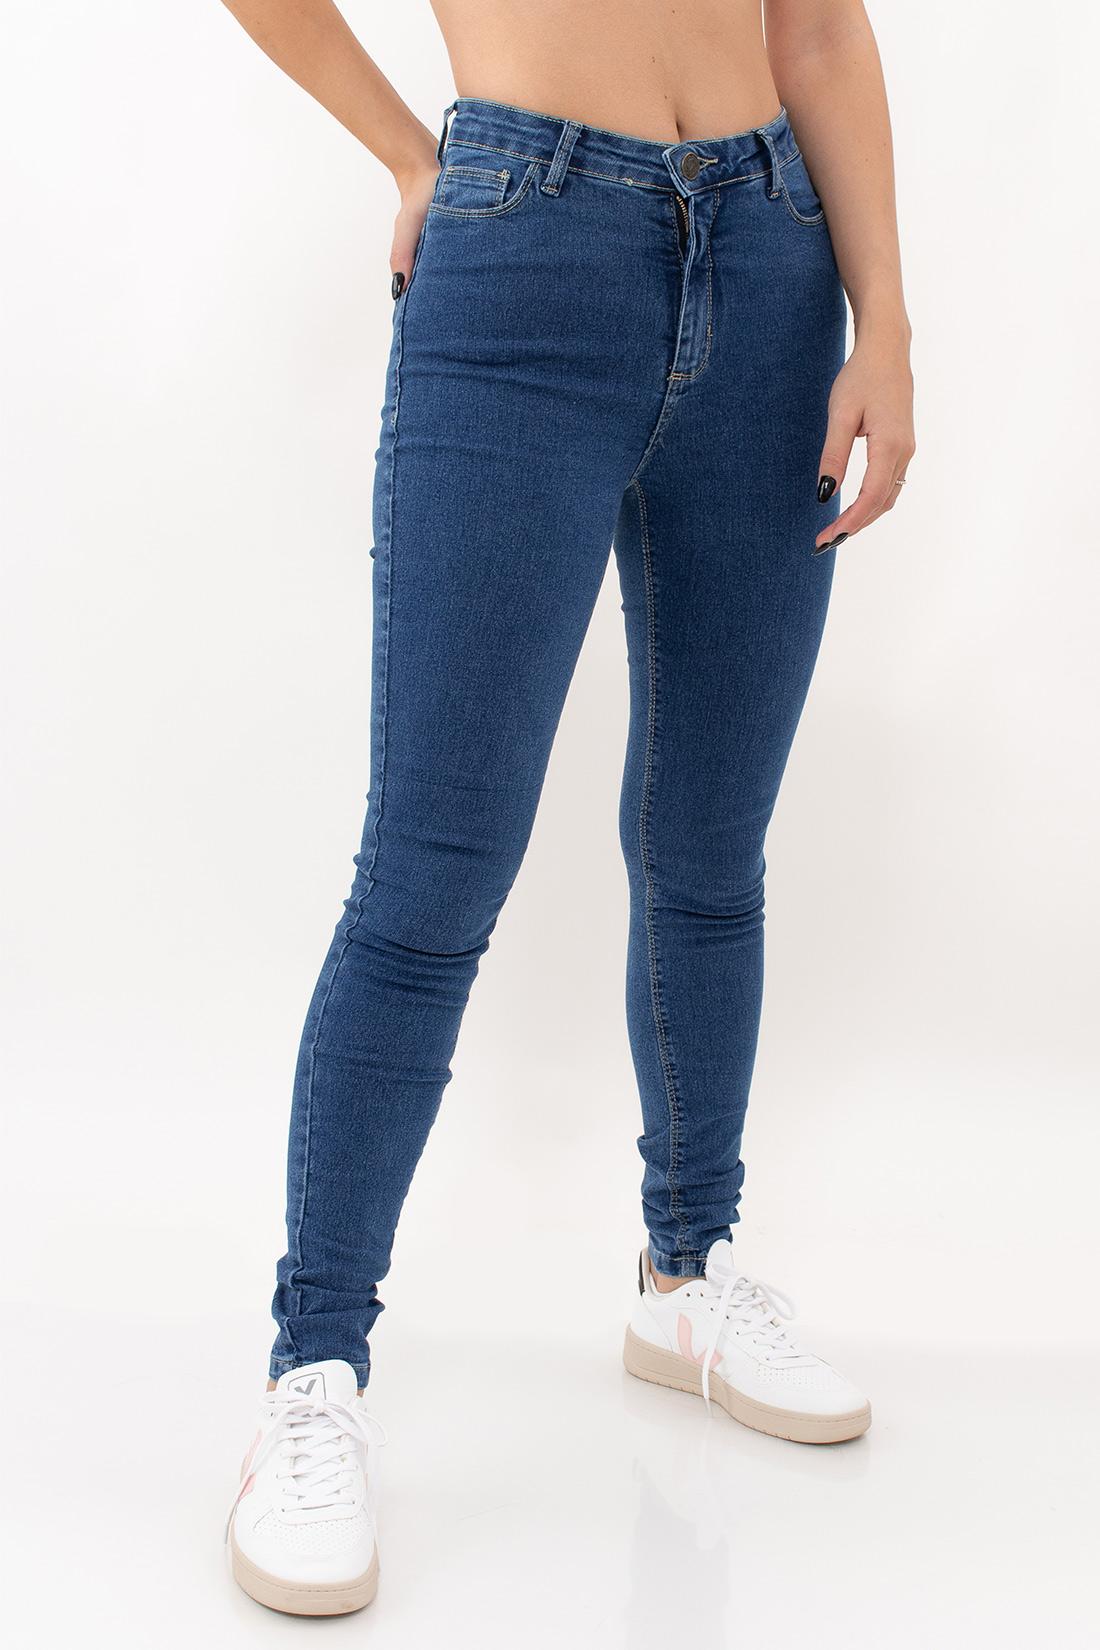 Calca Jeans Hering Super Skinny Basica